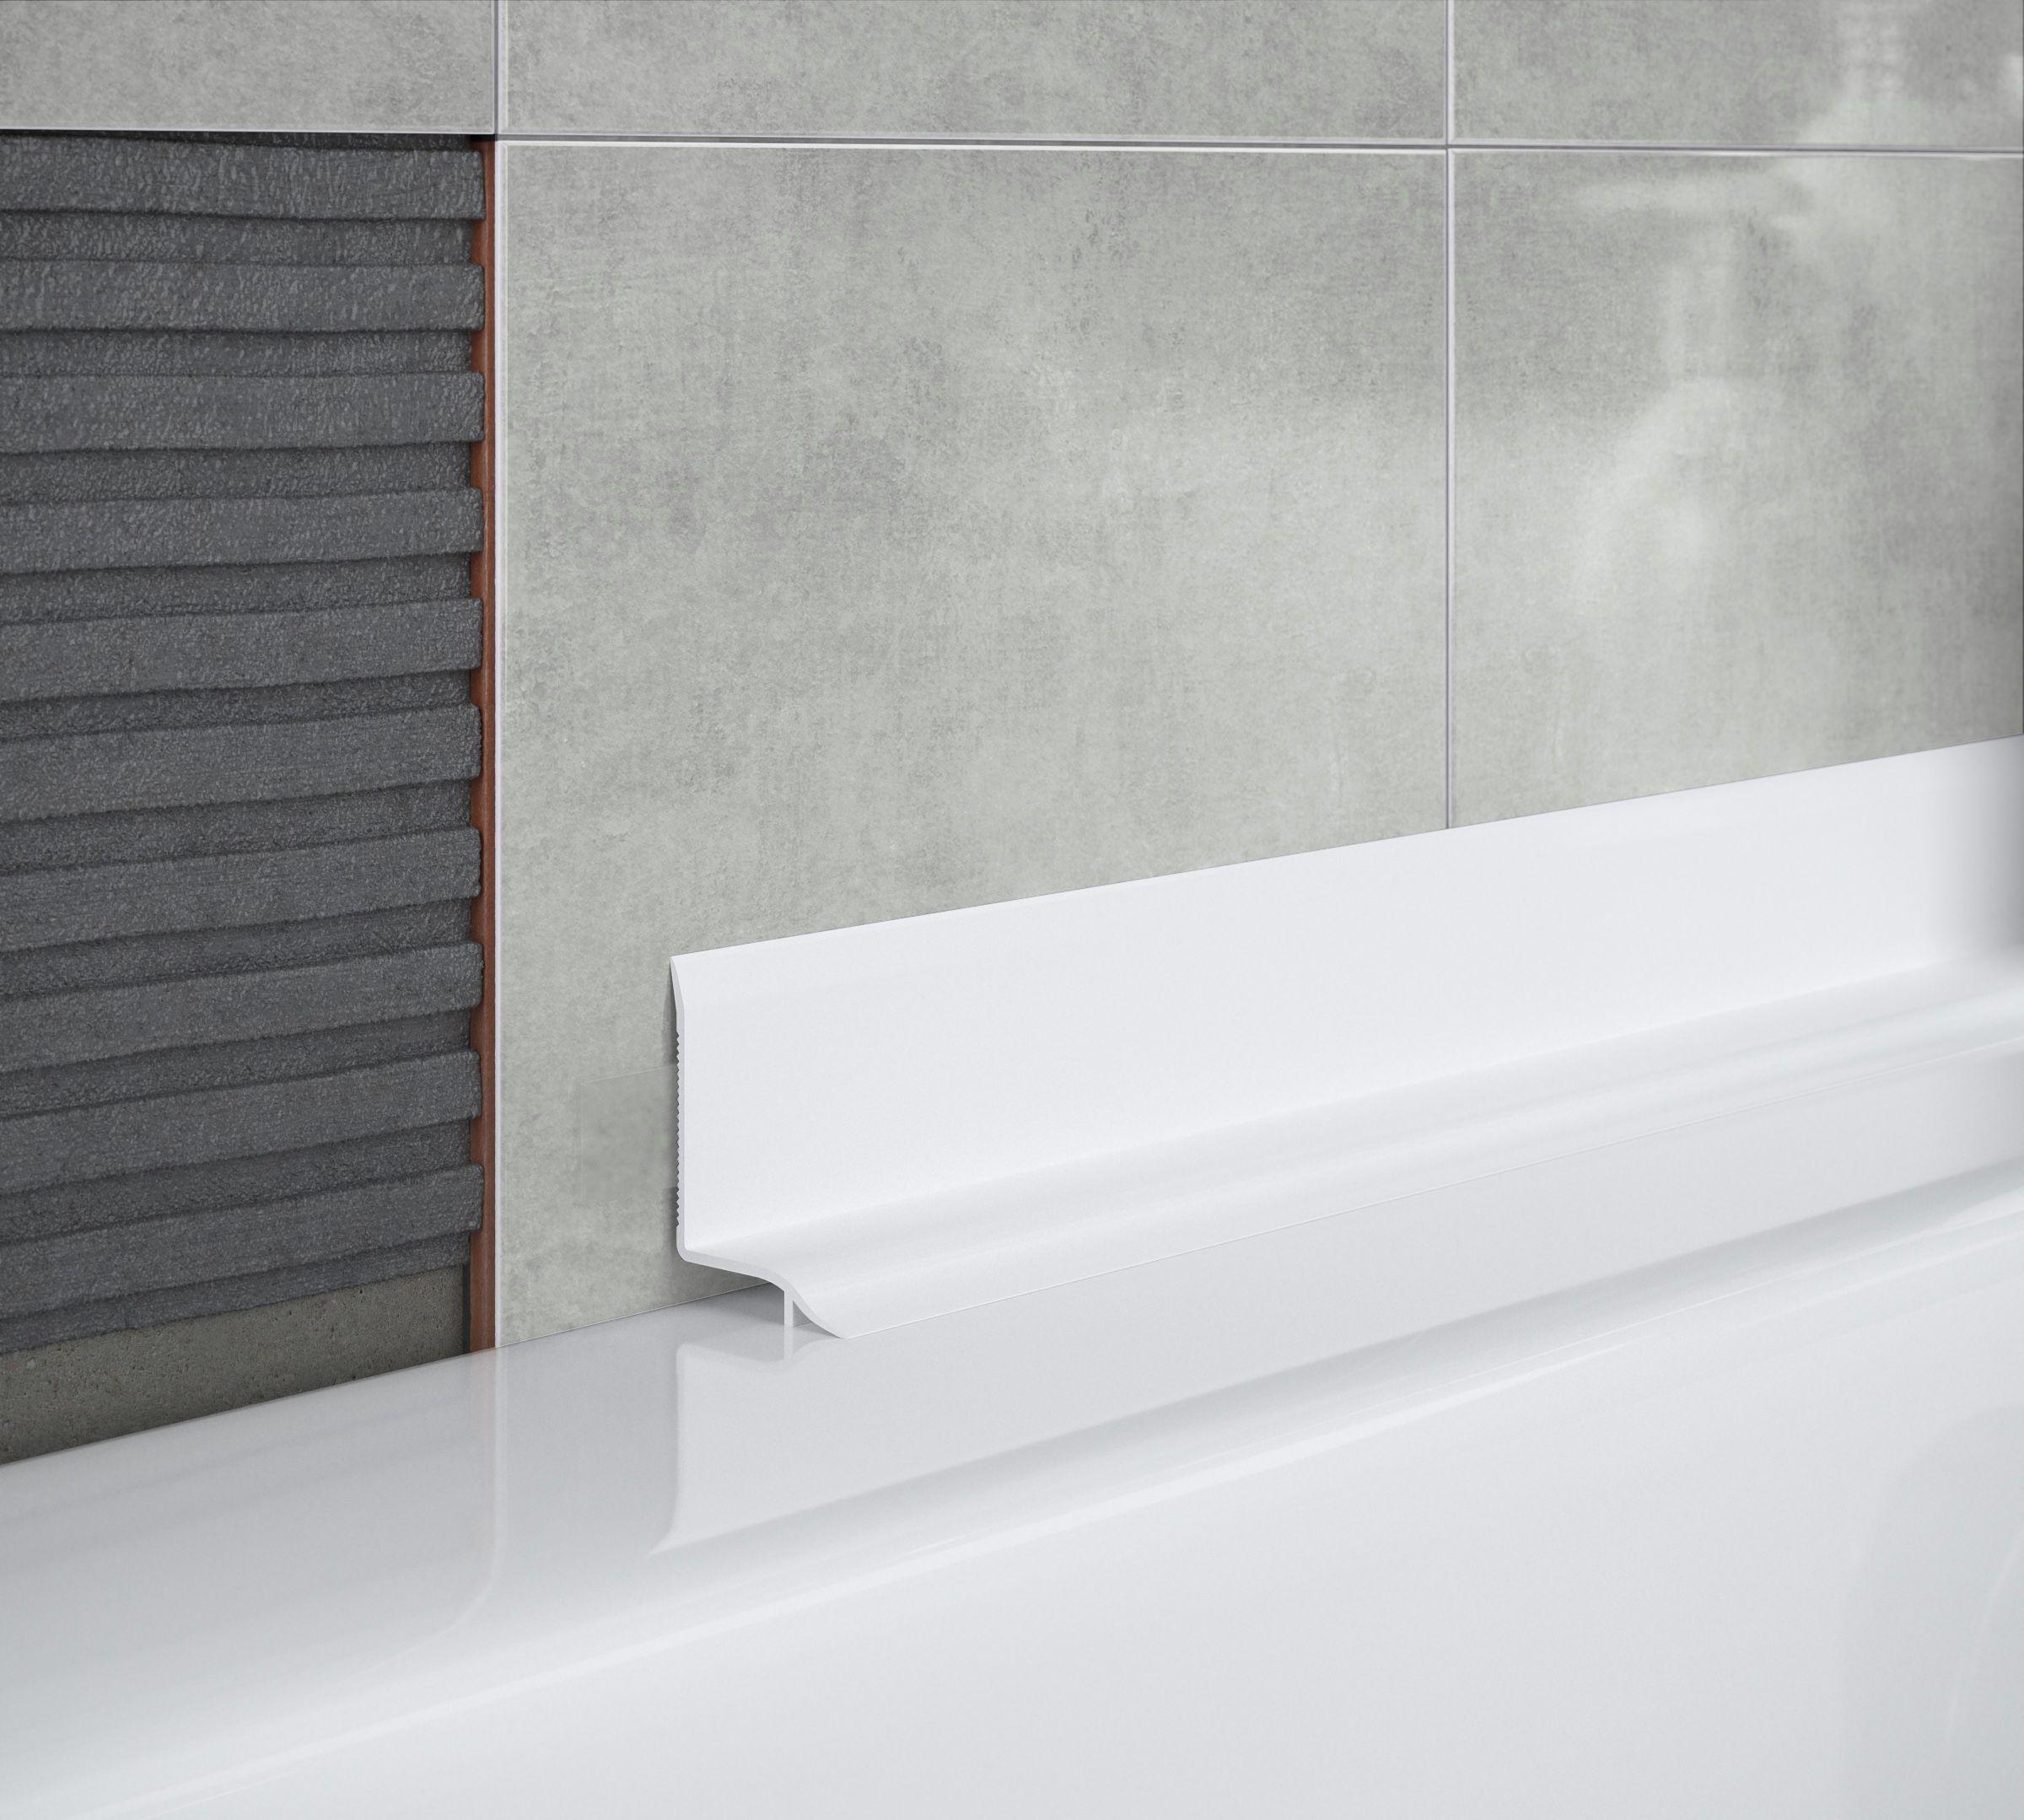 Bathroom Adhesive Tiles Self Adhesive Wall TilesSelfAdhesive ...